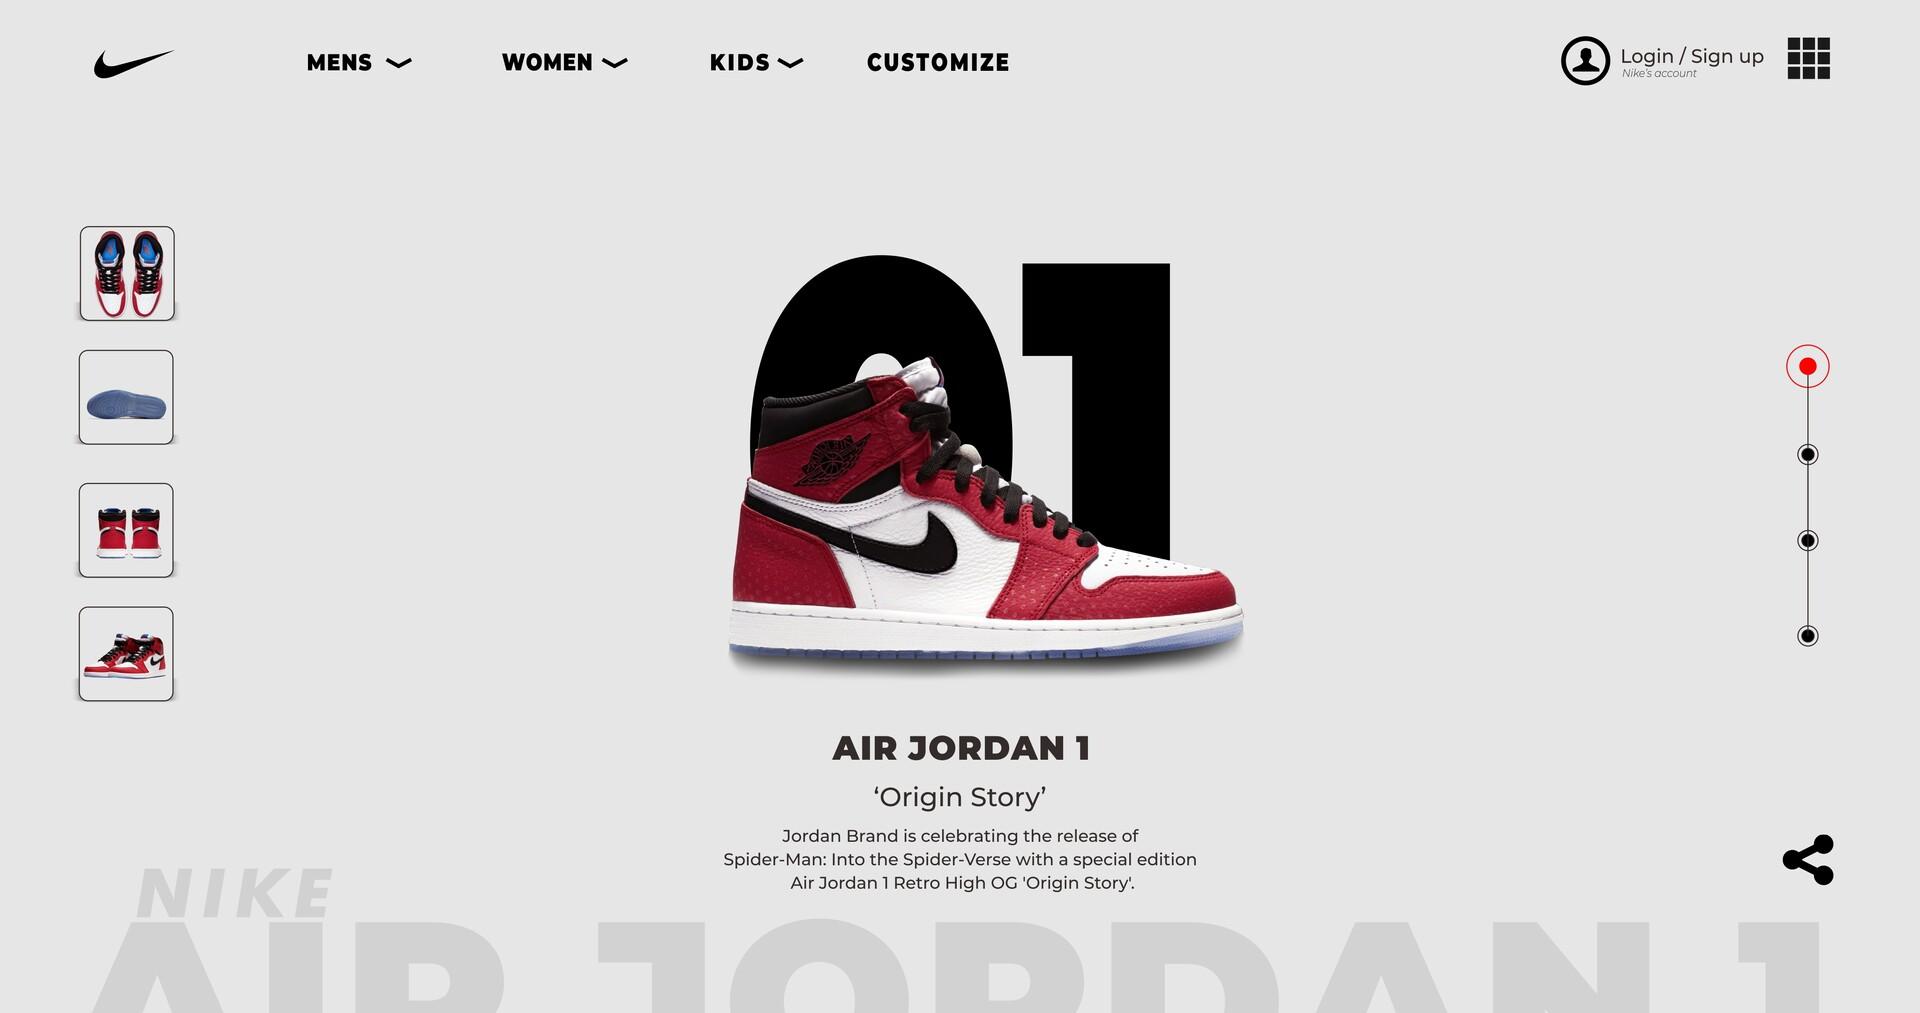 Confuso Capataz Fortaleza  Matee -o - Concept Web Design Nike